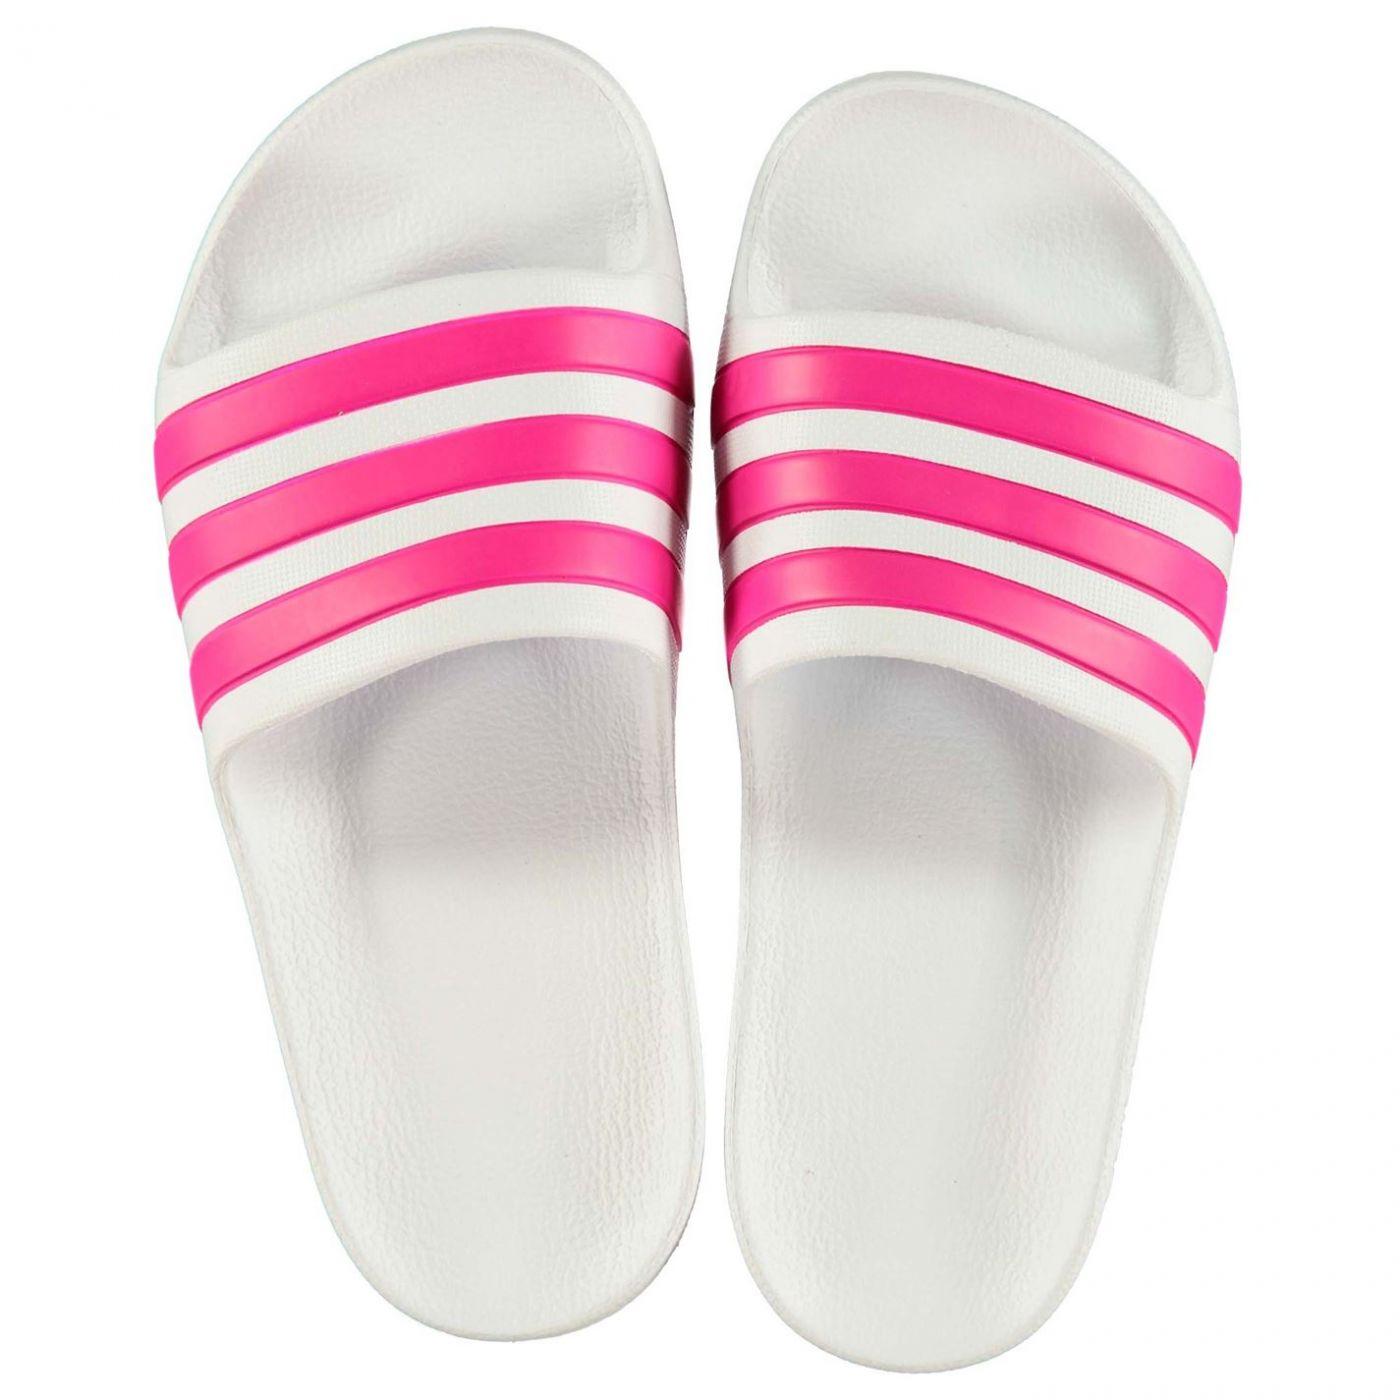 Adidas Duramo Slide Child Girls Pool Shoes